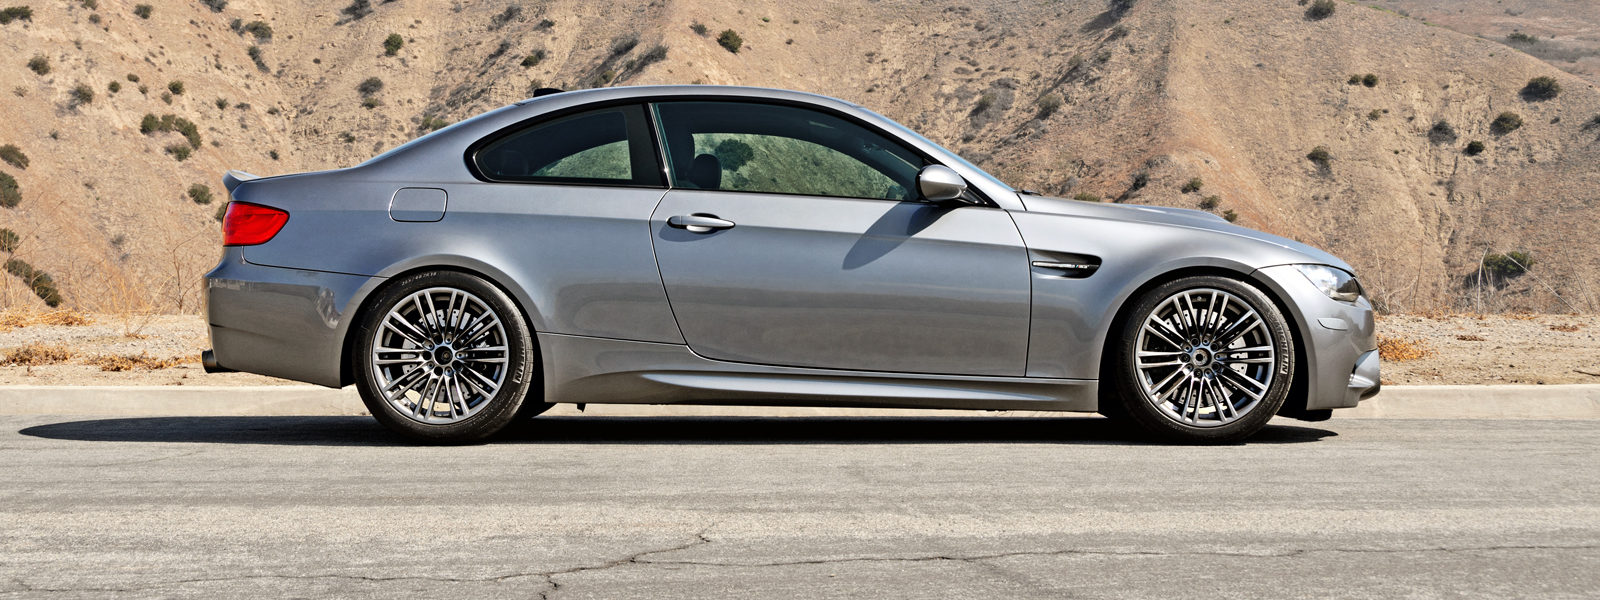 Space Gray E92 BMW M3